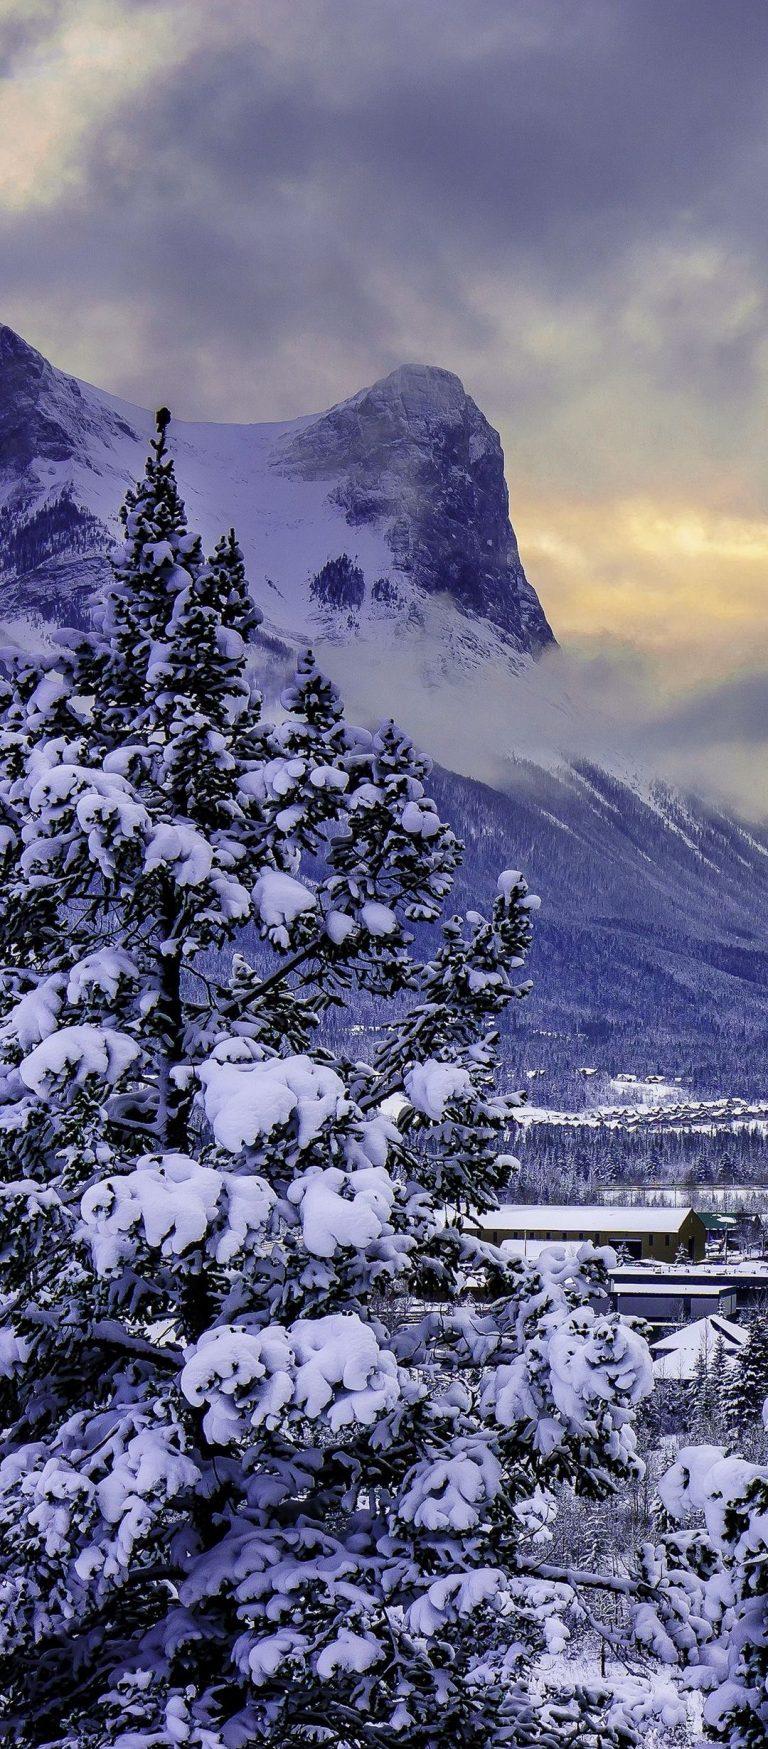 Canada Mountain Alberta Banff National Park 1080x2460 768x1749